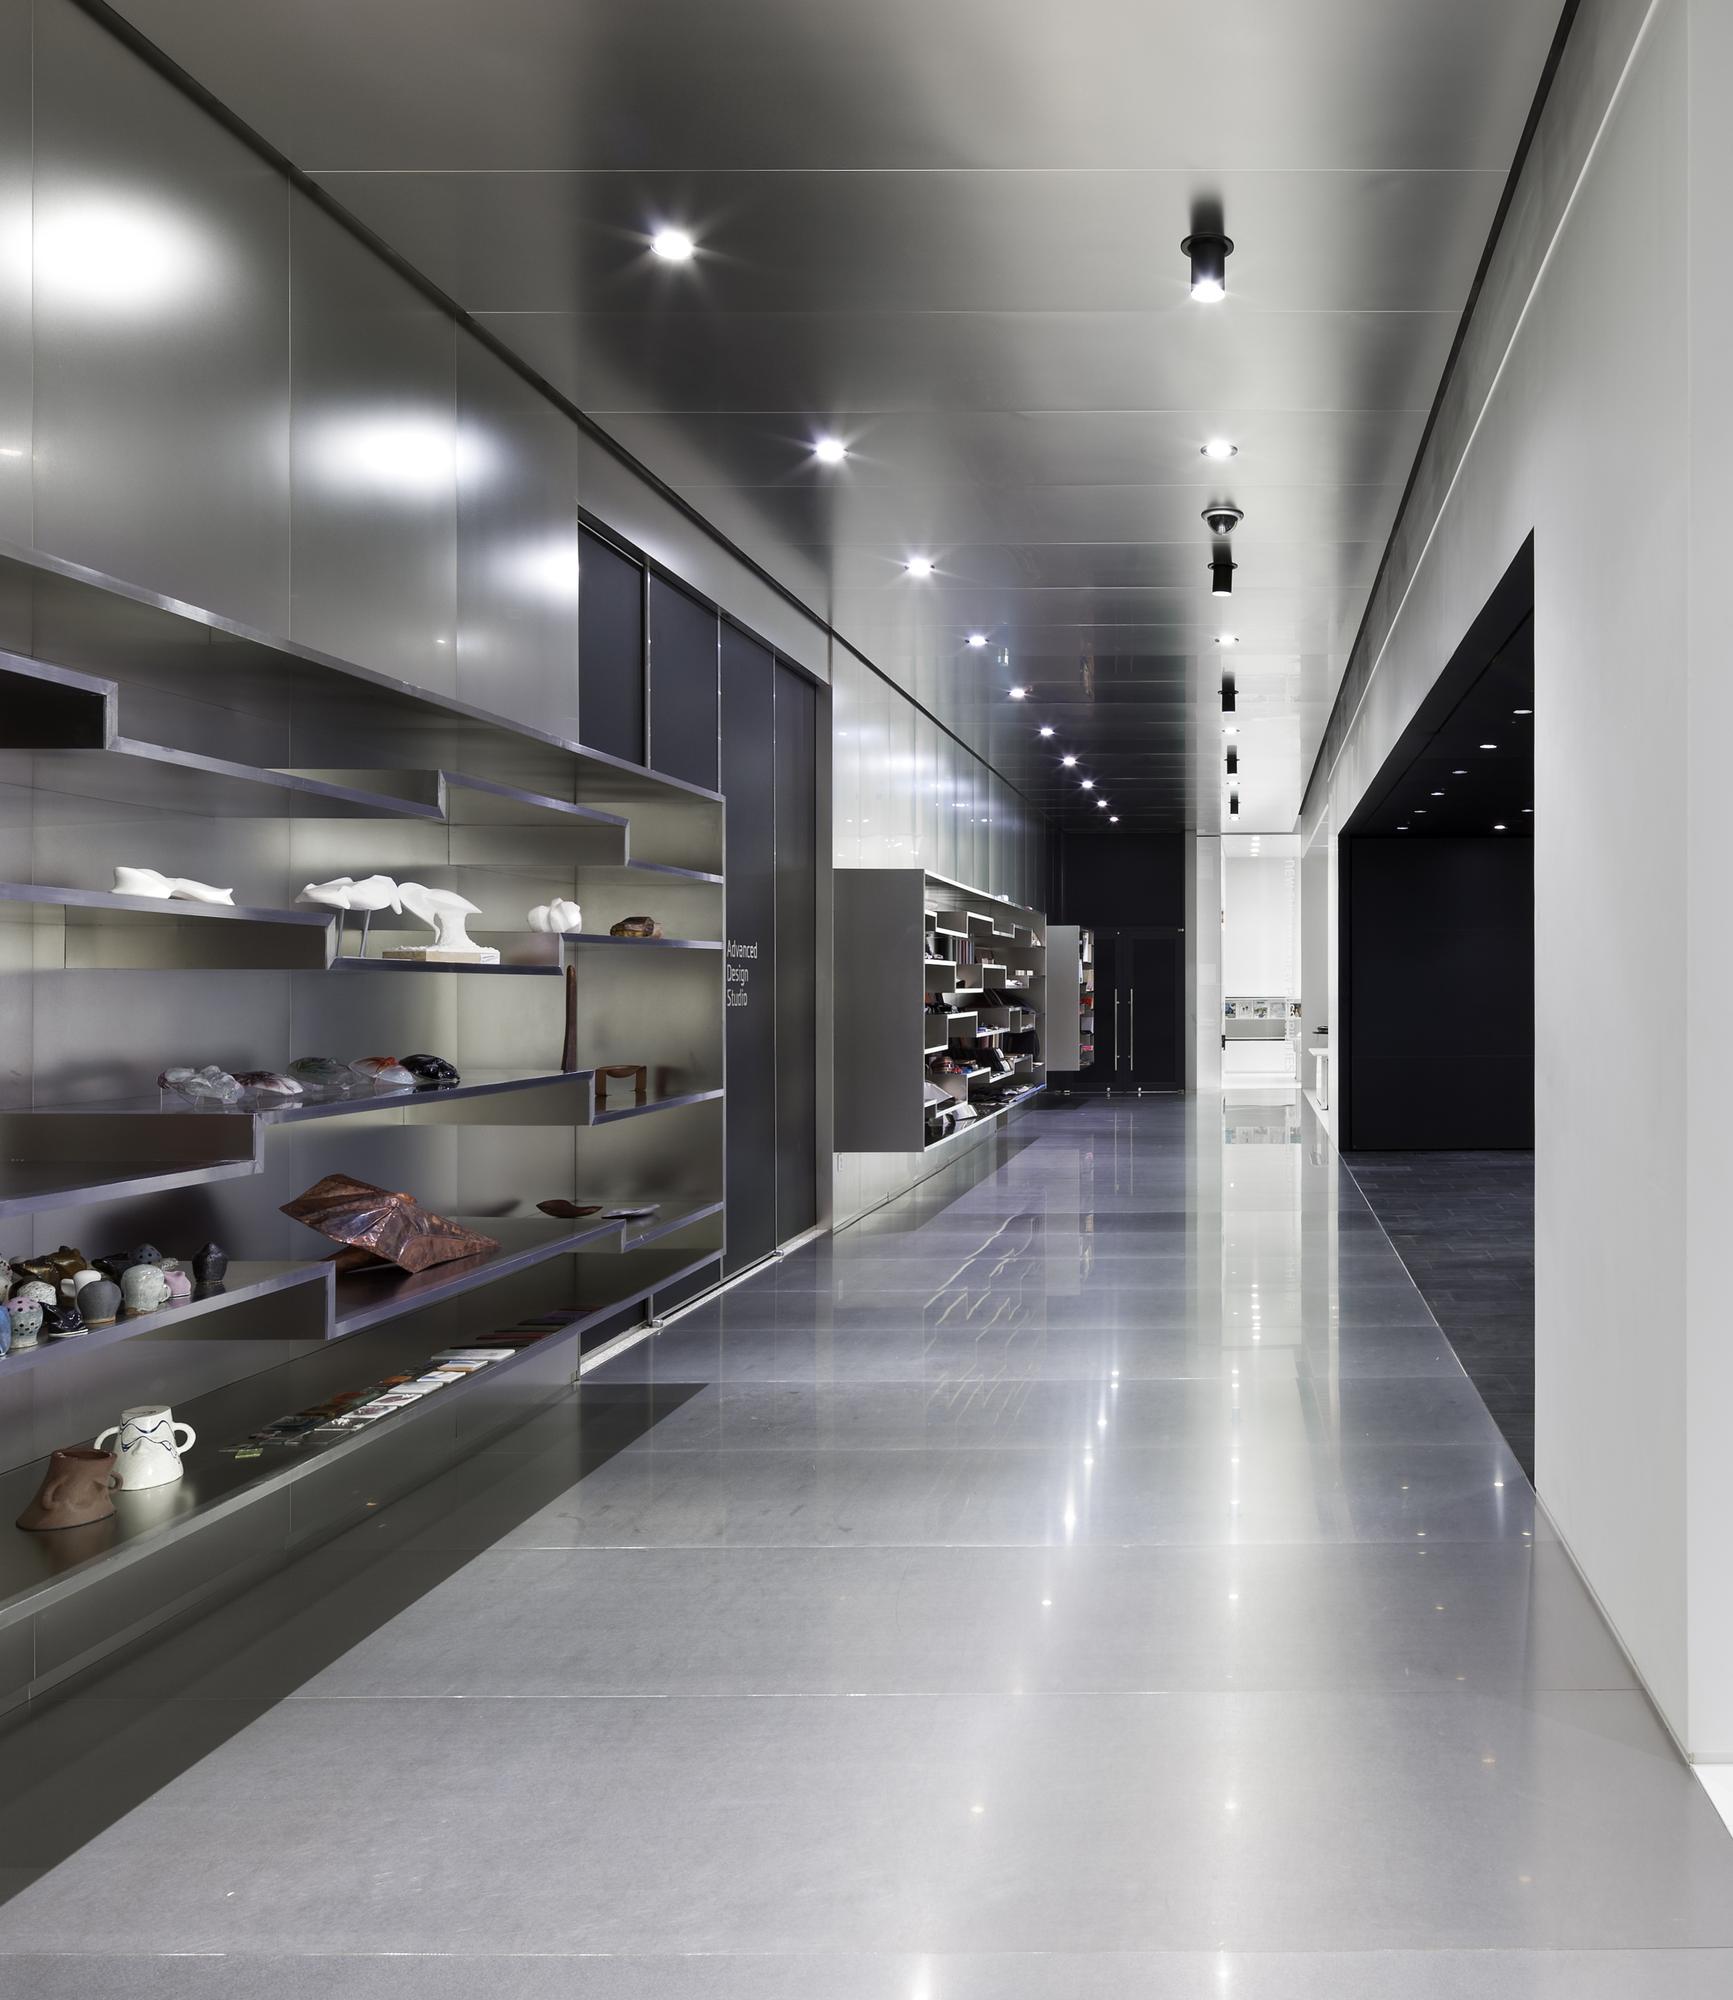 Hyundai Advances Design Studio / Delugan Meissl Associated Architects